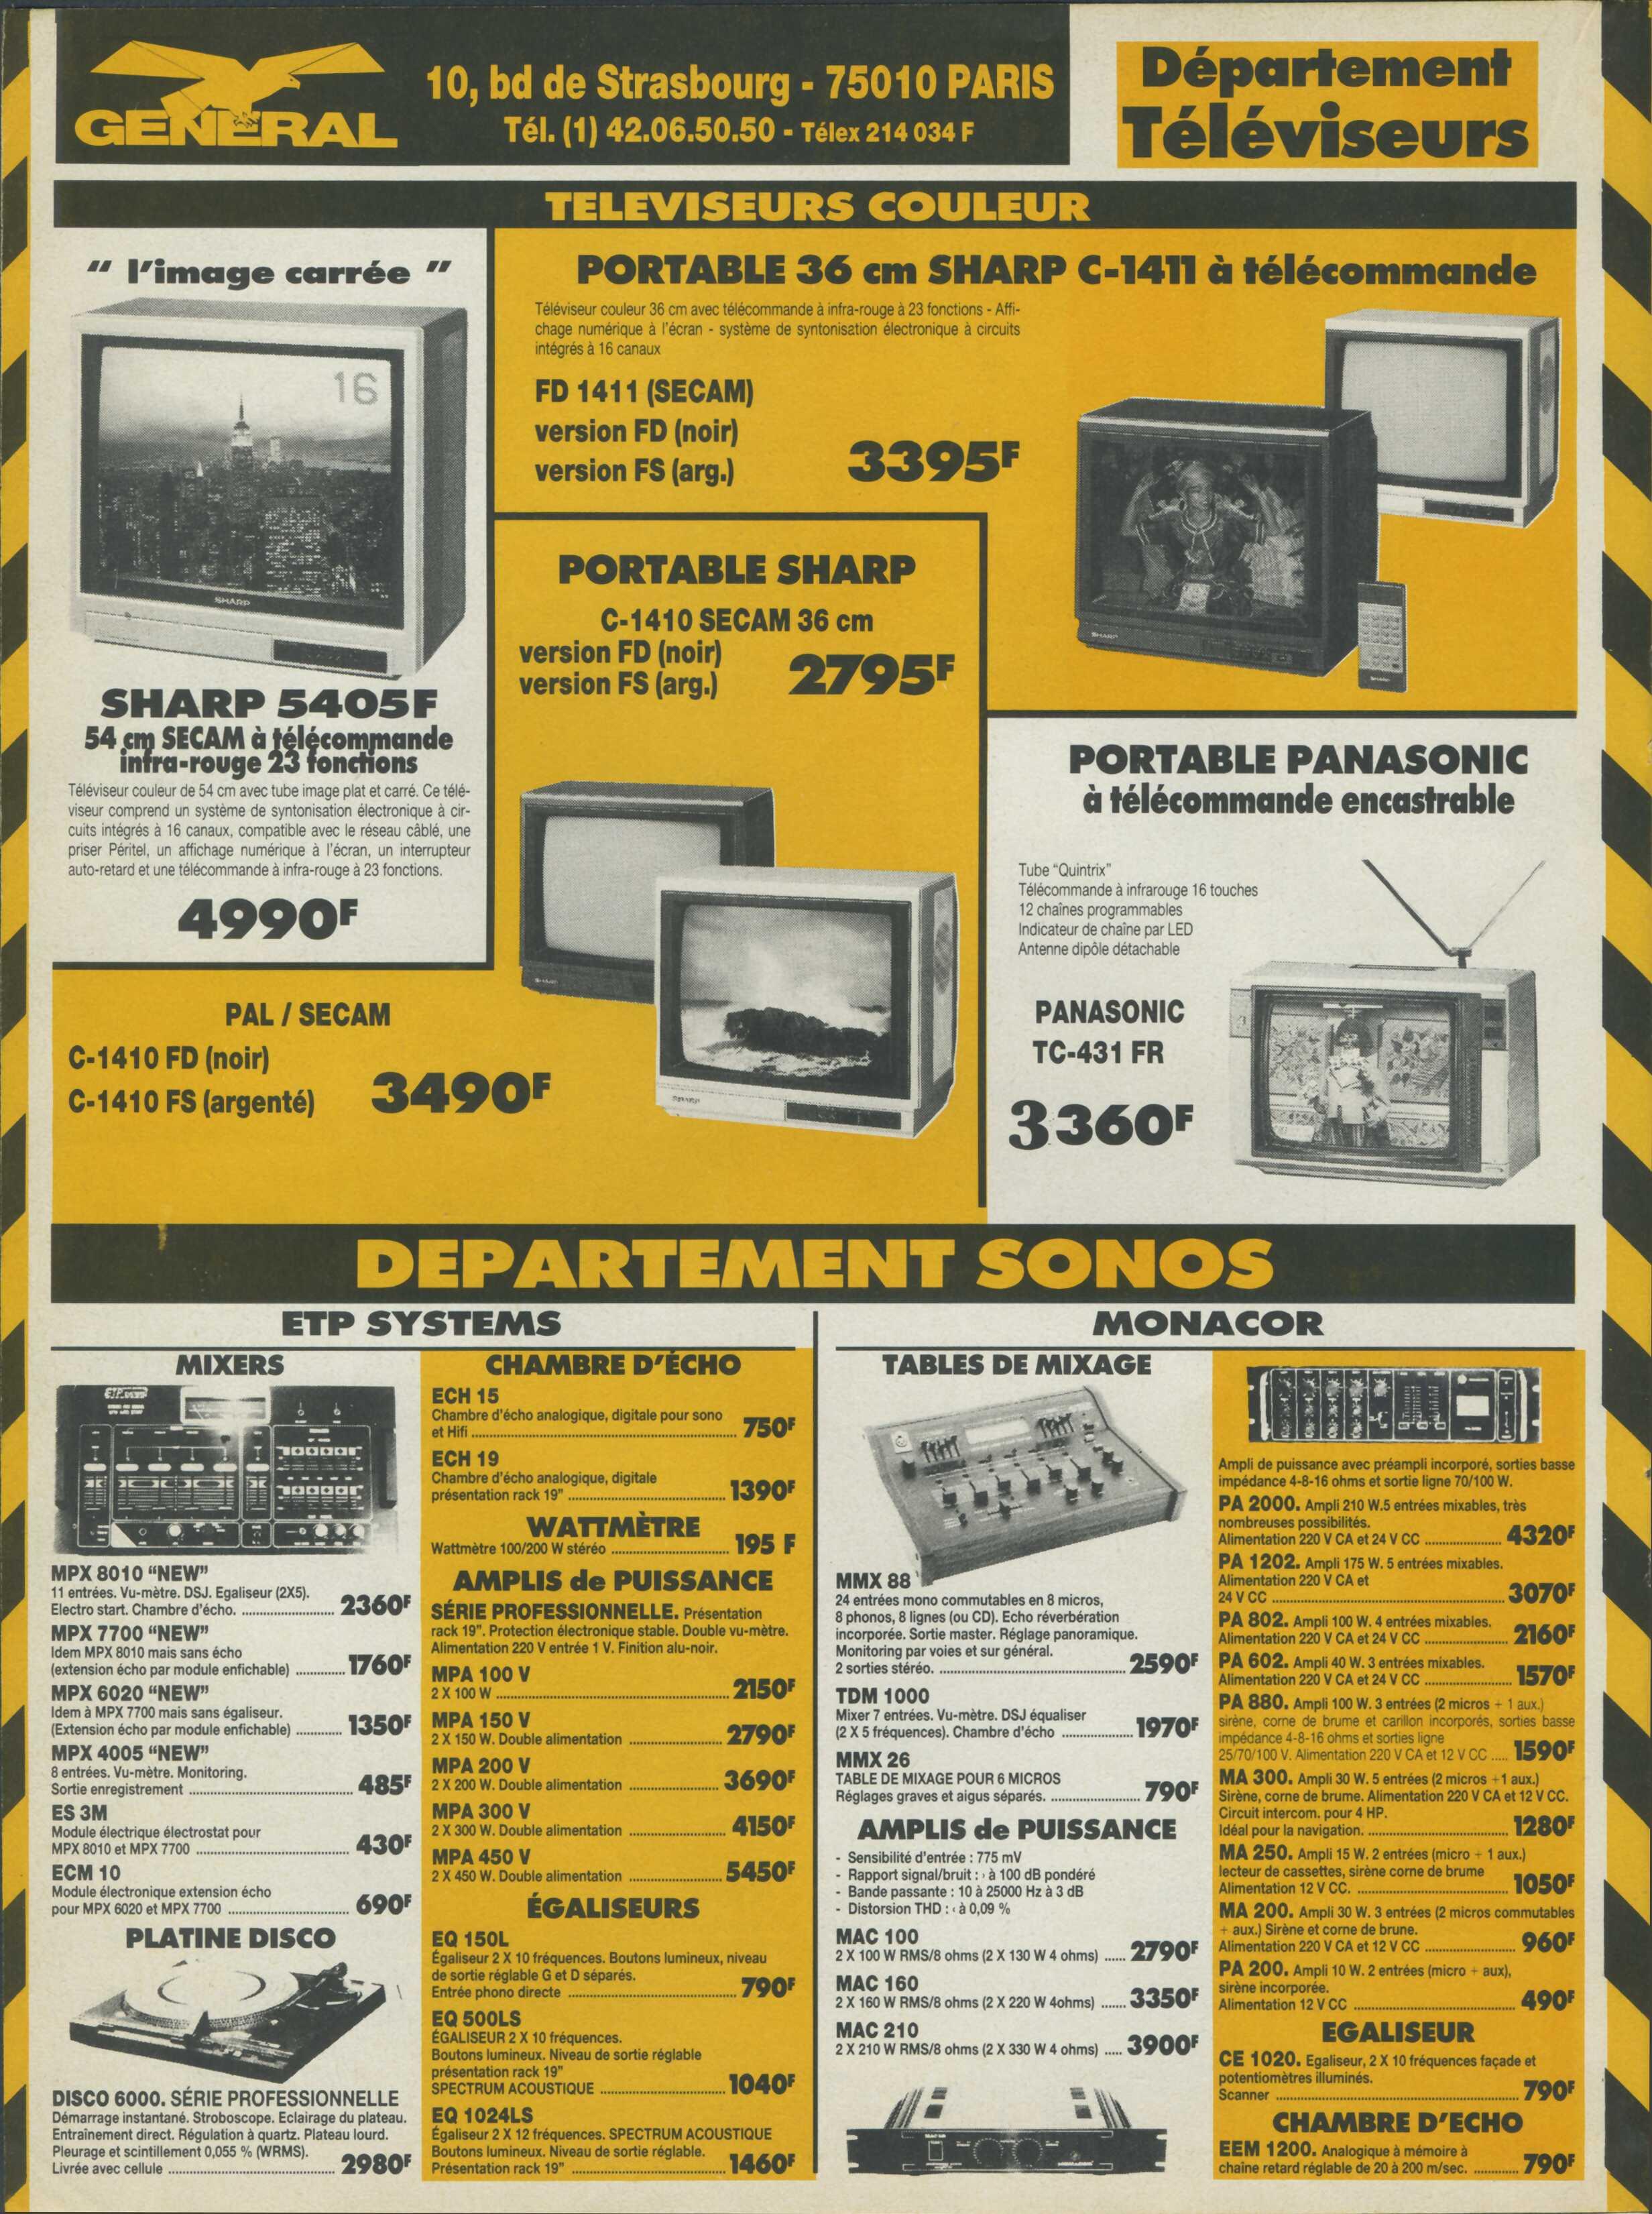 * AMSTRAD CPC * TOPIC OFFICIEL - Page 4 Amstrad%20Magazine%20019%20-%20Page%20084%20%281987-02%29